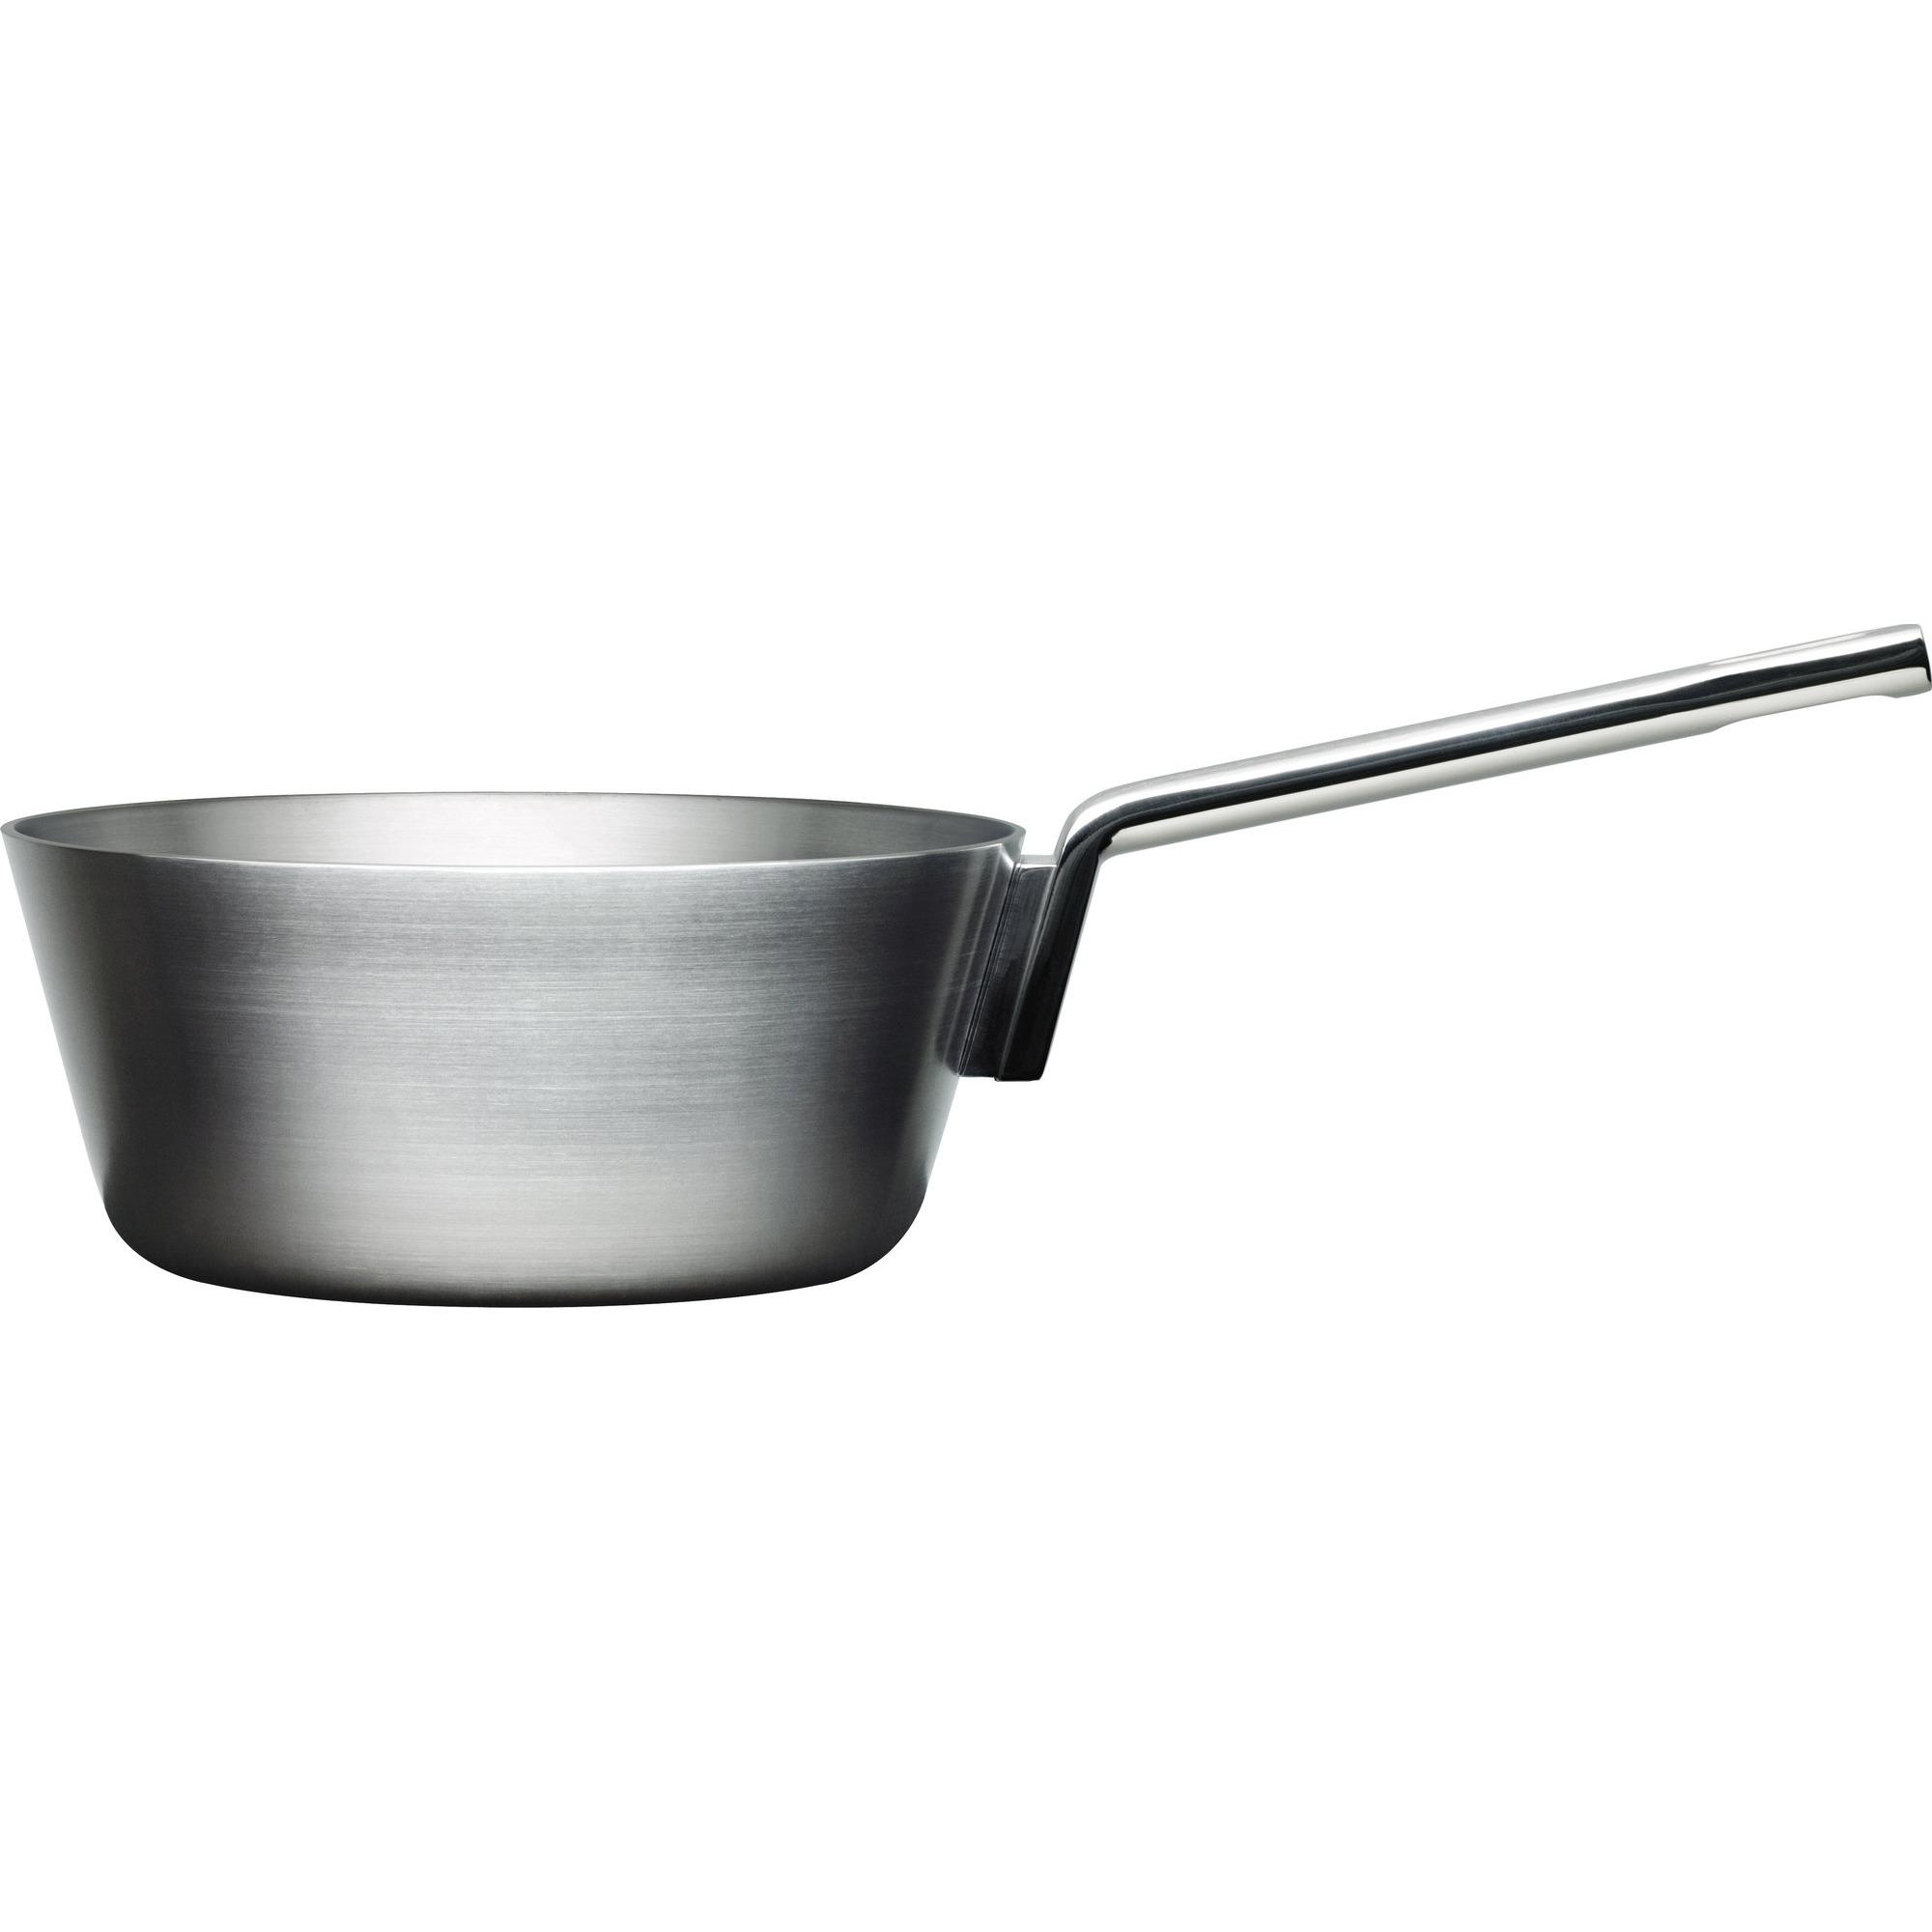 Iittala Tools Sauteuse utan lock 1 liter